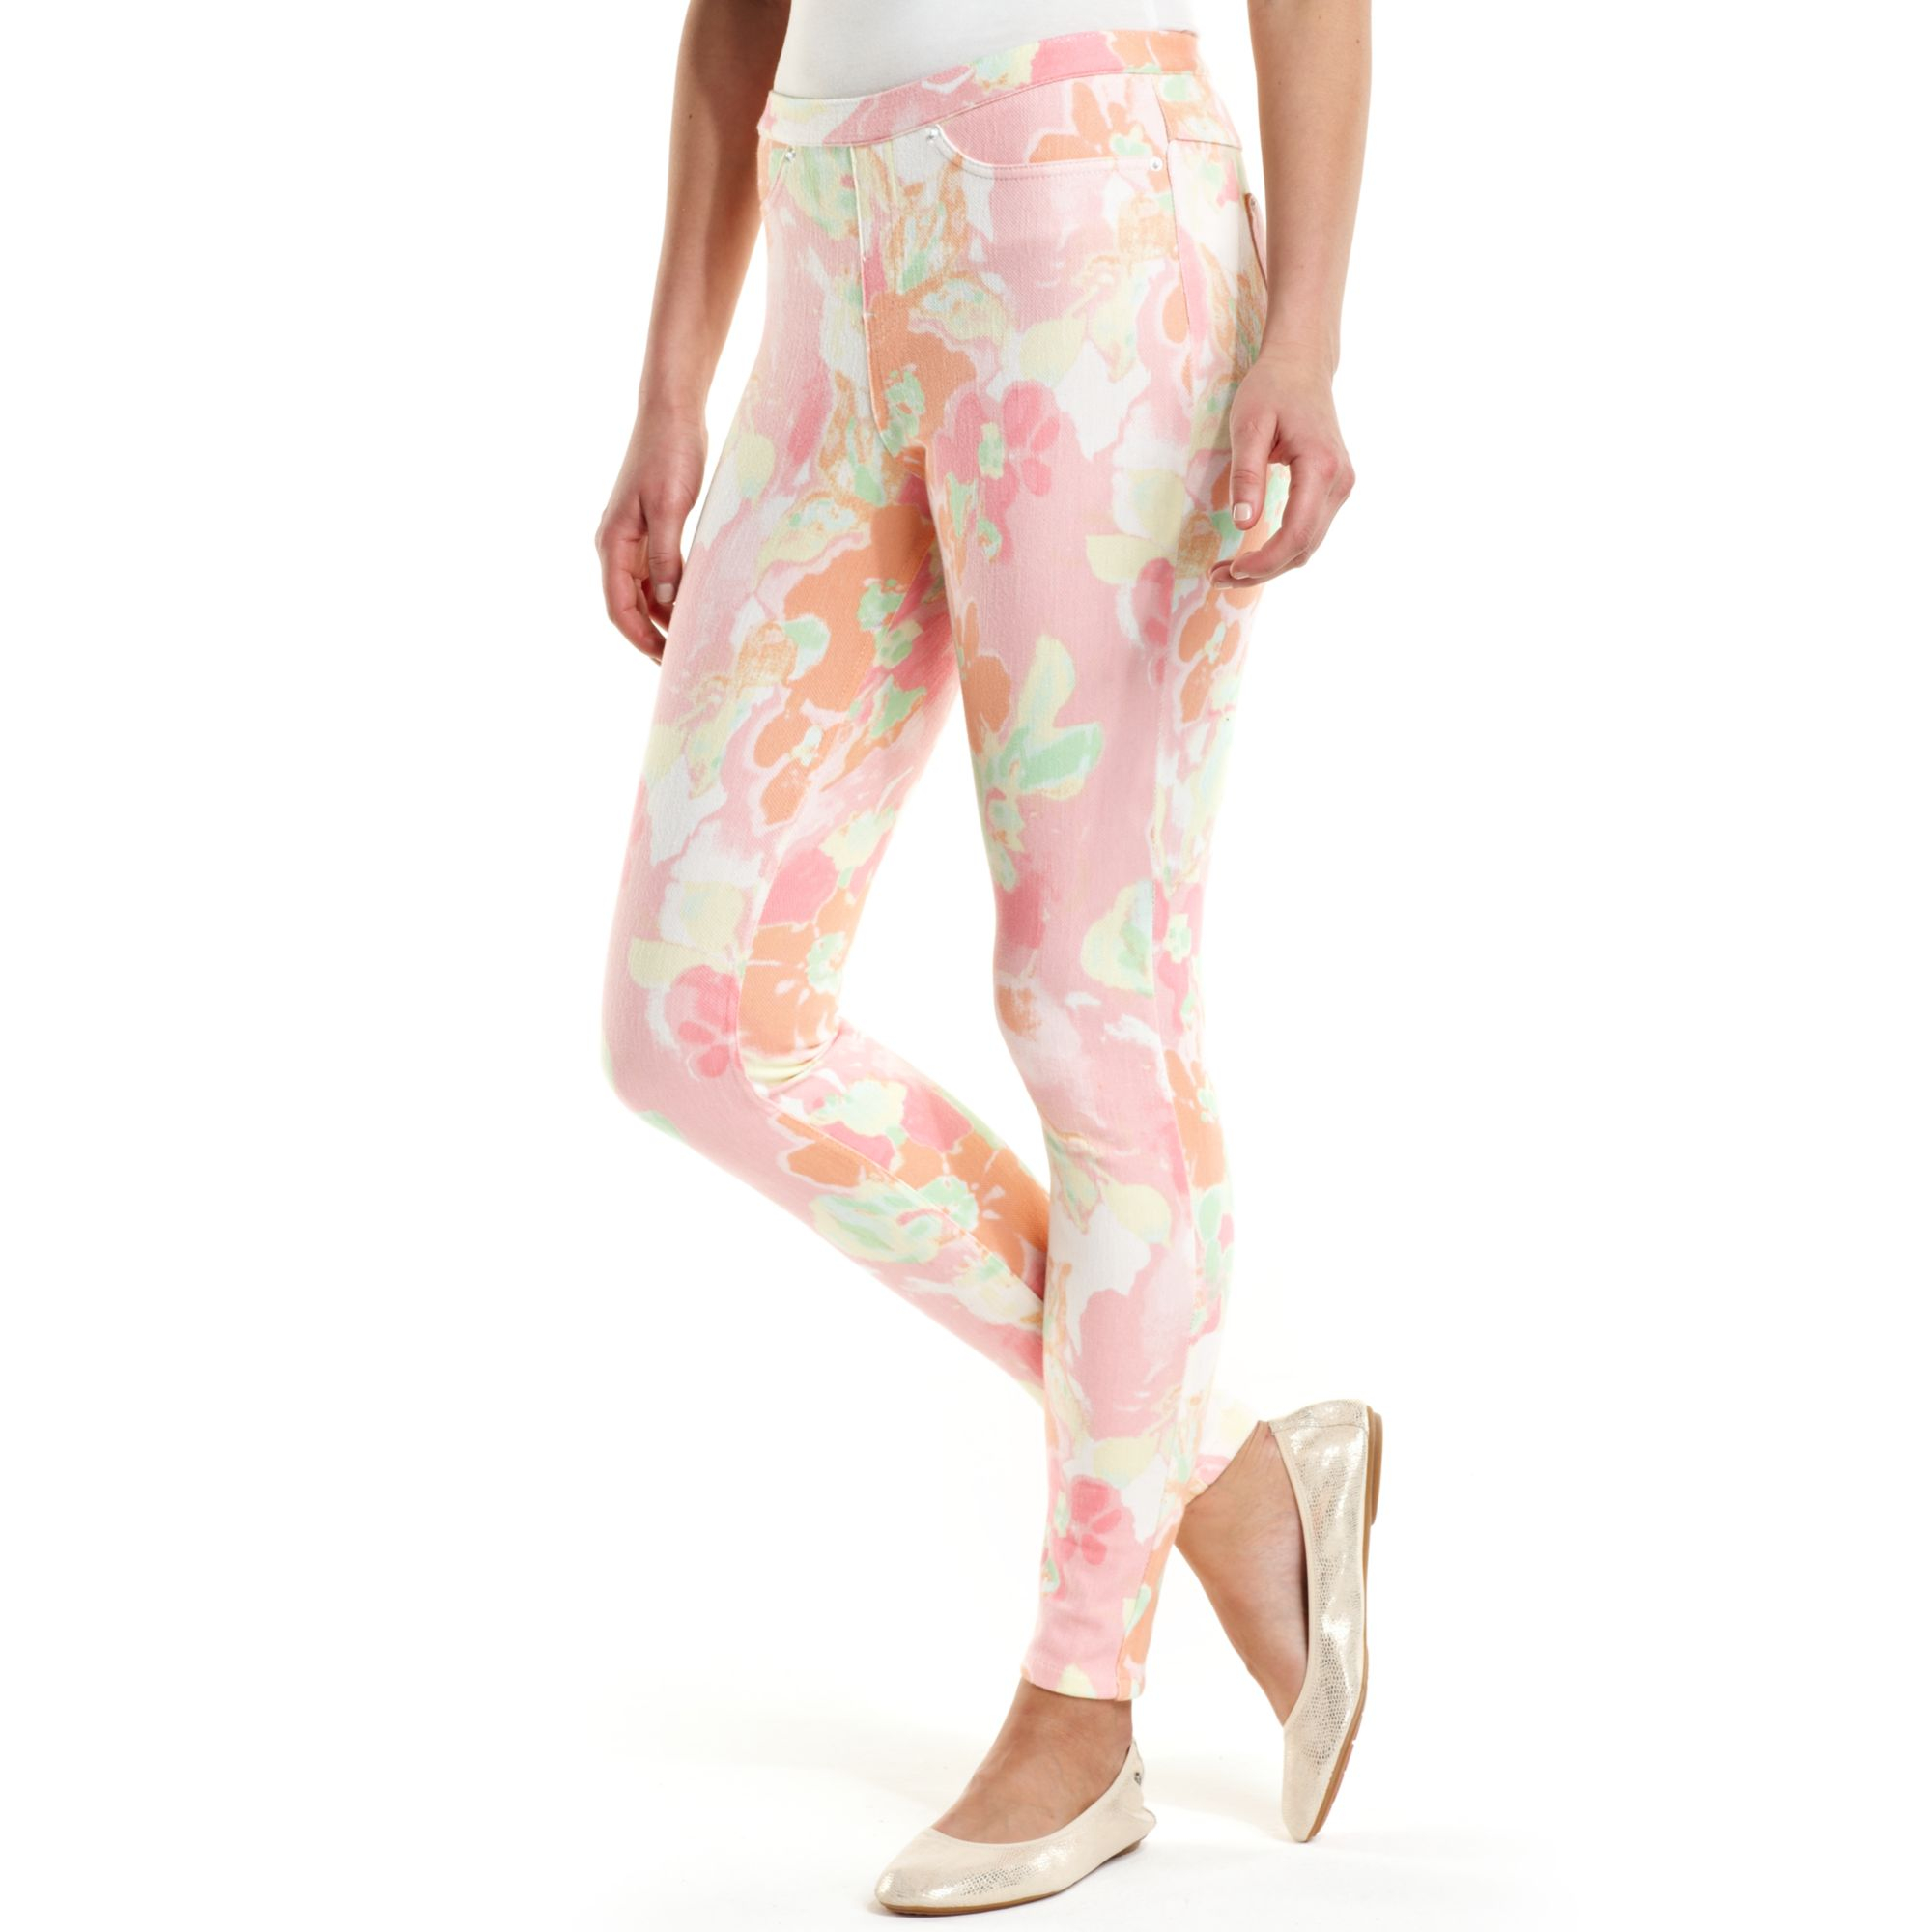 b32efd749d663 Hue Watercolor Floral Jeans Leggings in Pink - Lyst